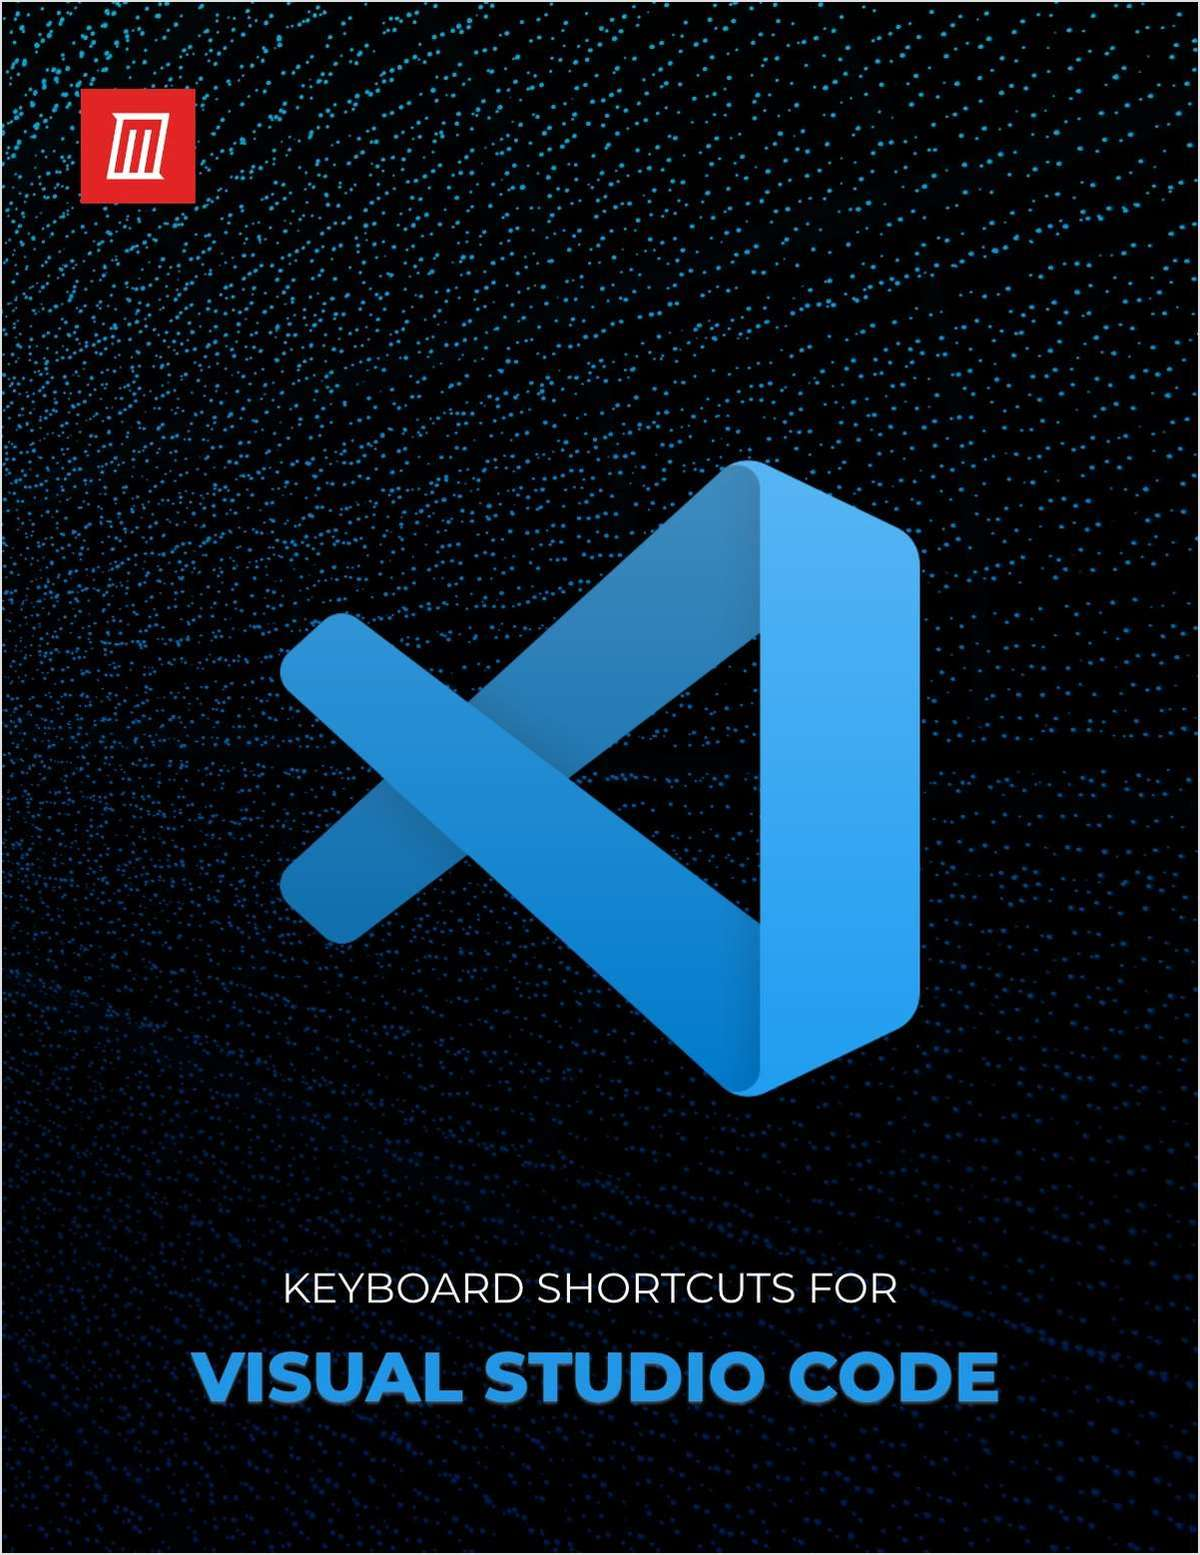 Essential Keyboard Shortcuts for Visual Studio Code